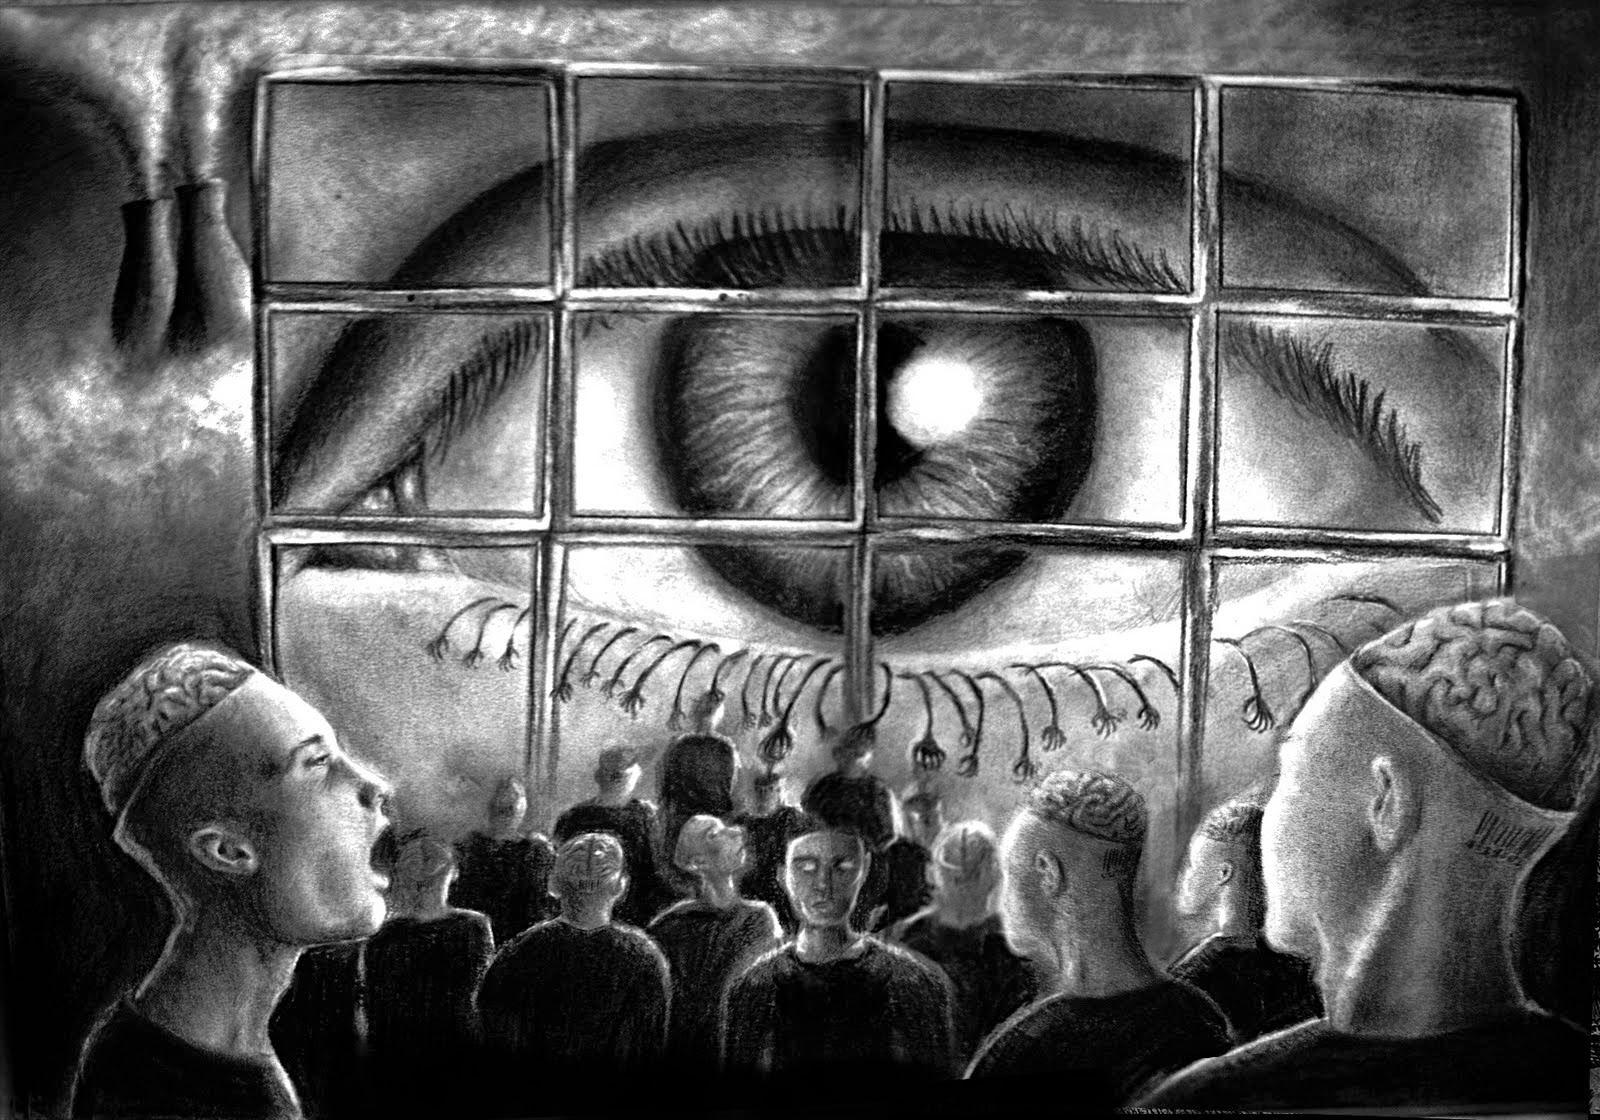 Mind Control  (έγινε και στην Ελλάδα και γίνεται ακομα! με κάλο αποτέλεσμα!) και μυστικές υπηρεσίες